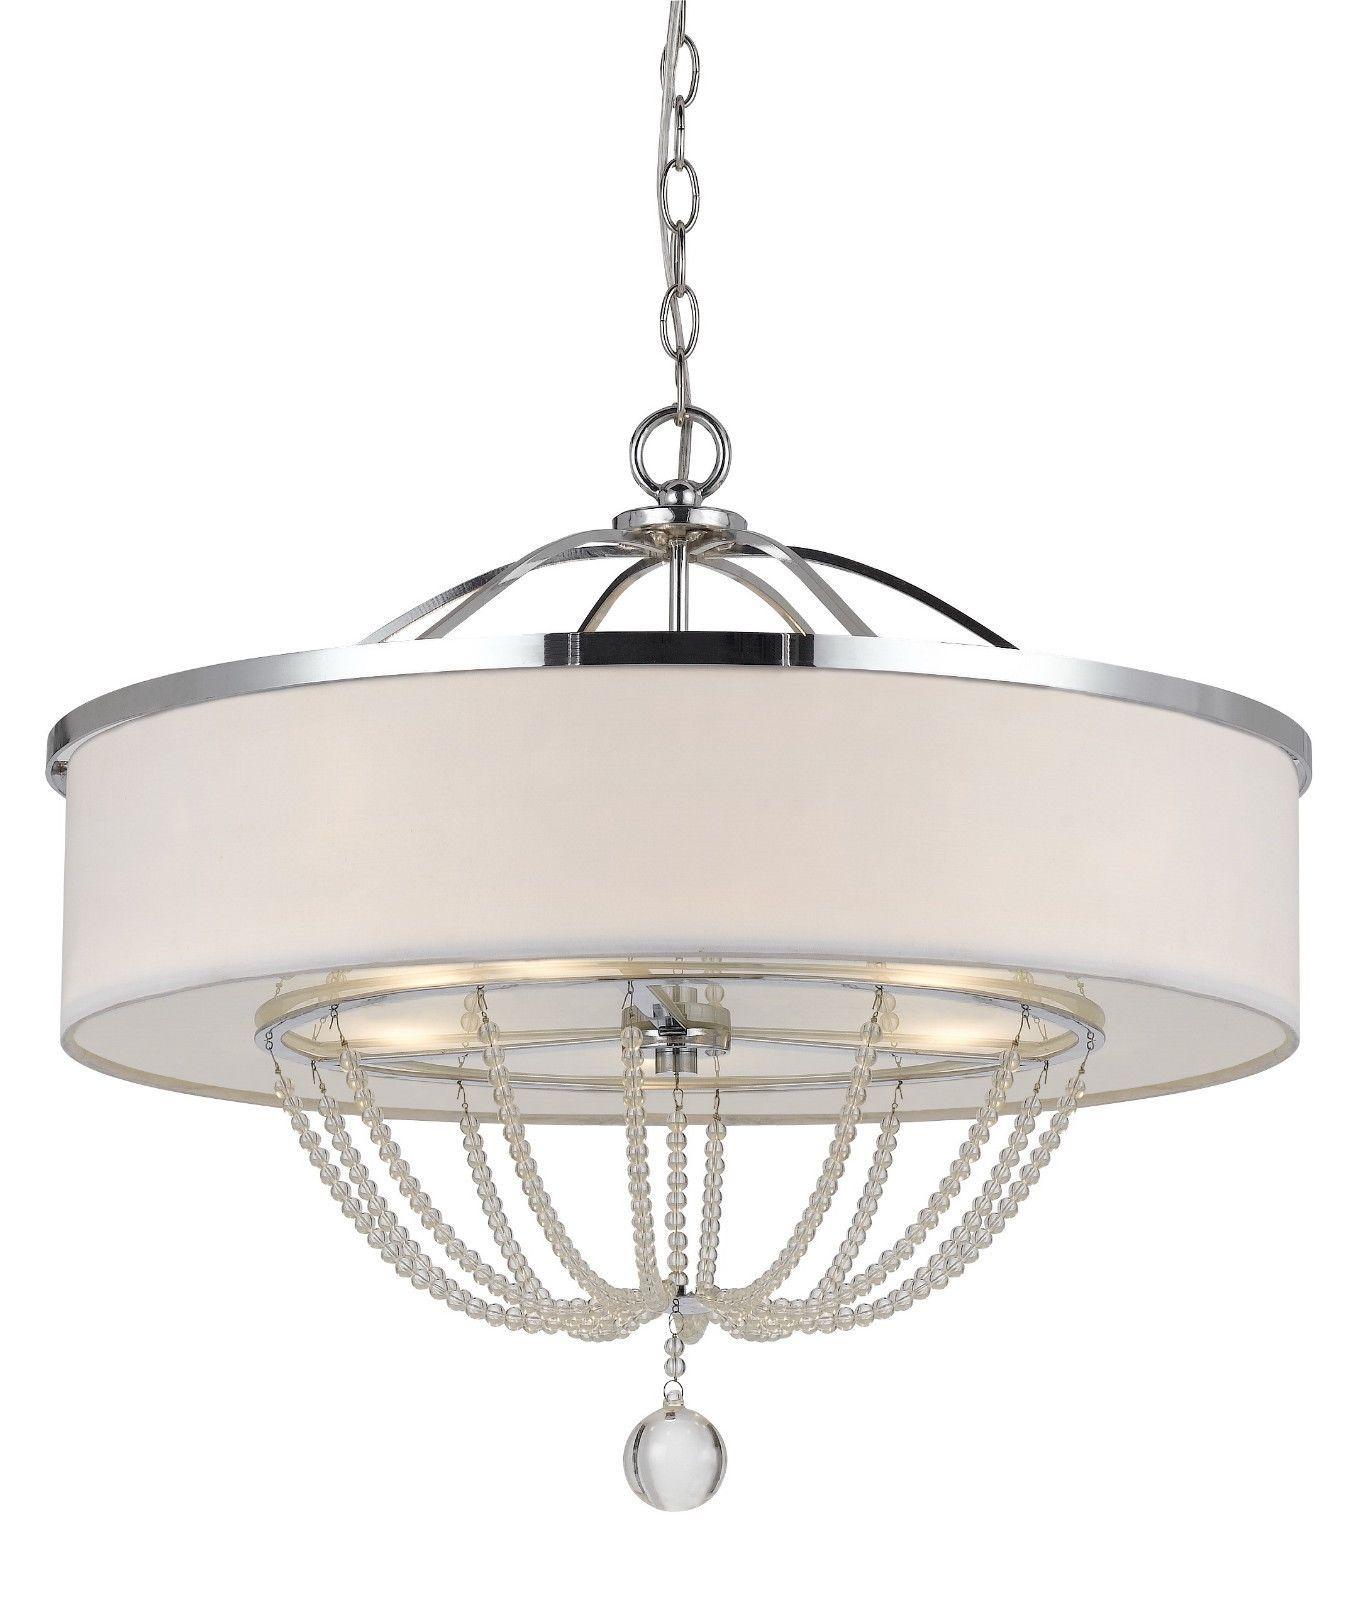 Modern Metal Chandelier: Modern White Fabric With Chrome Metal & Crystals Drum Pendant Light Fixture  Chandelier Hanging Lamp 24,Lighting